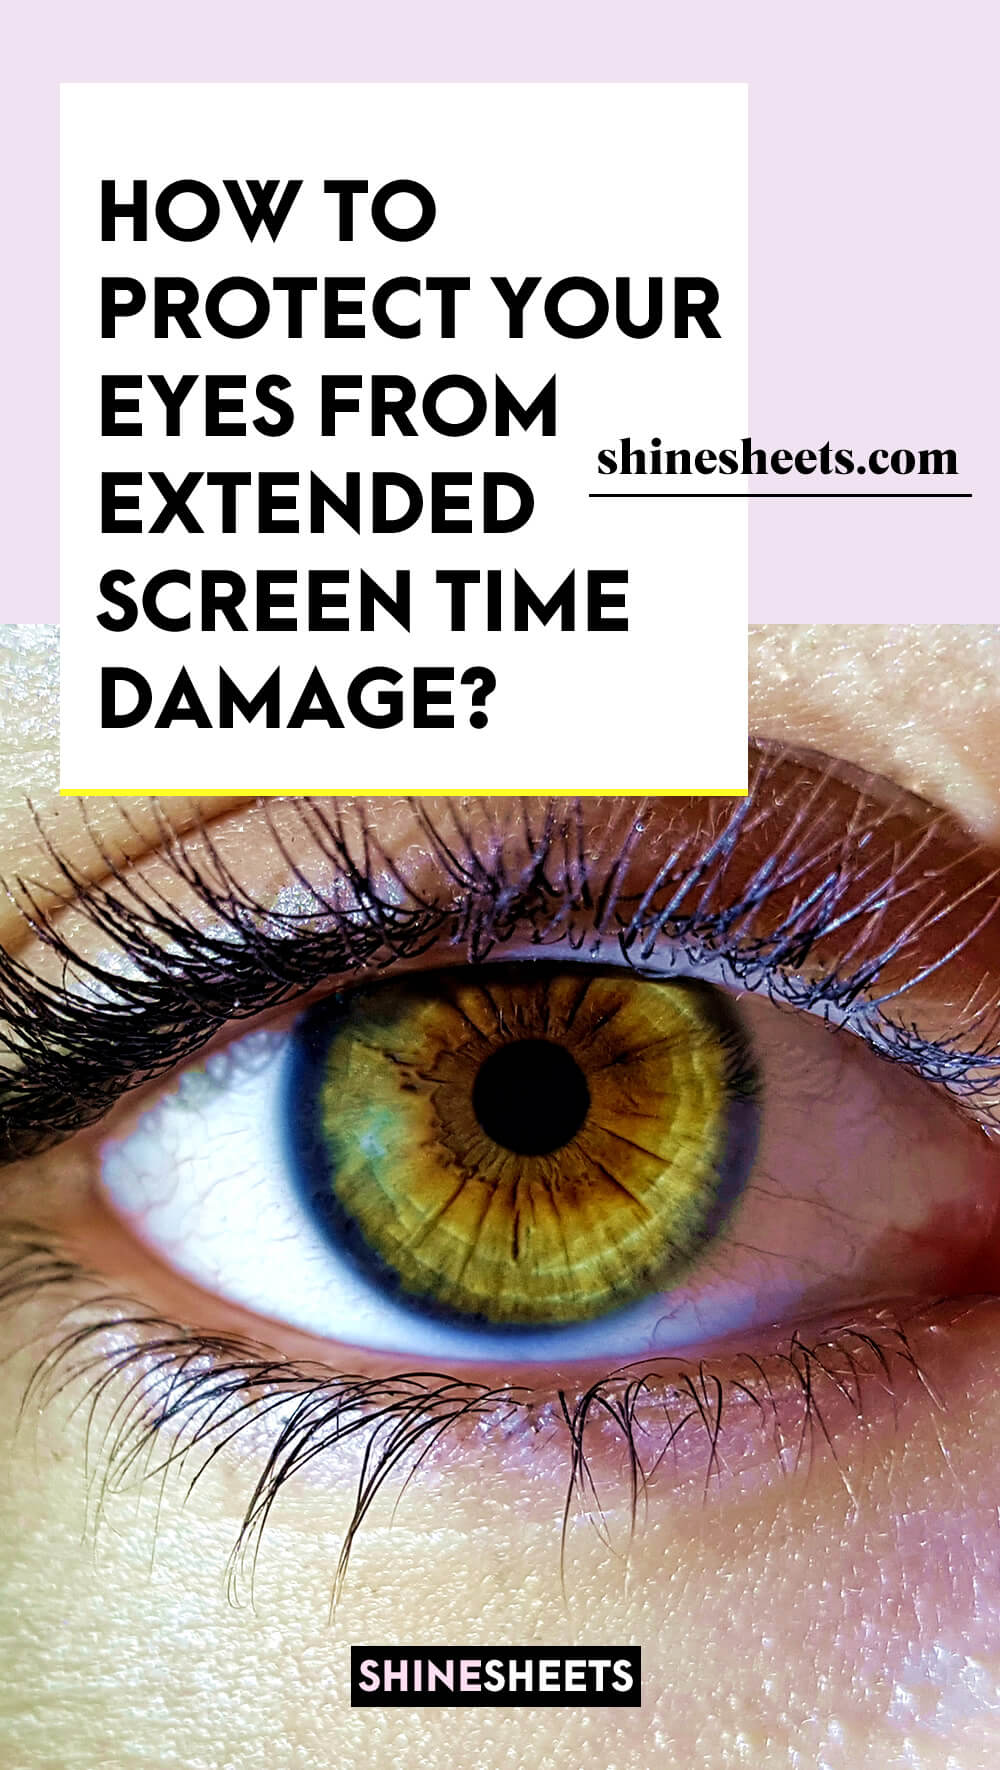 strained eye